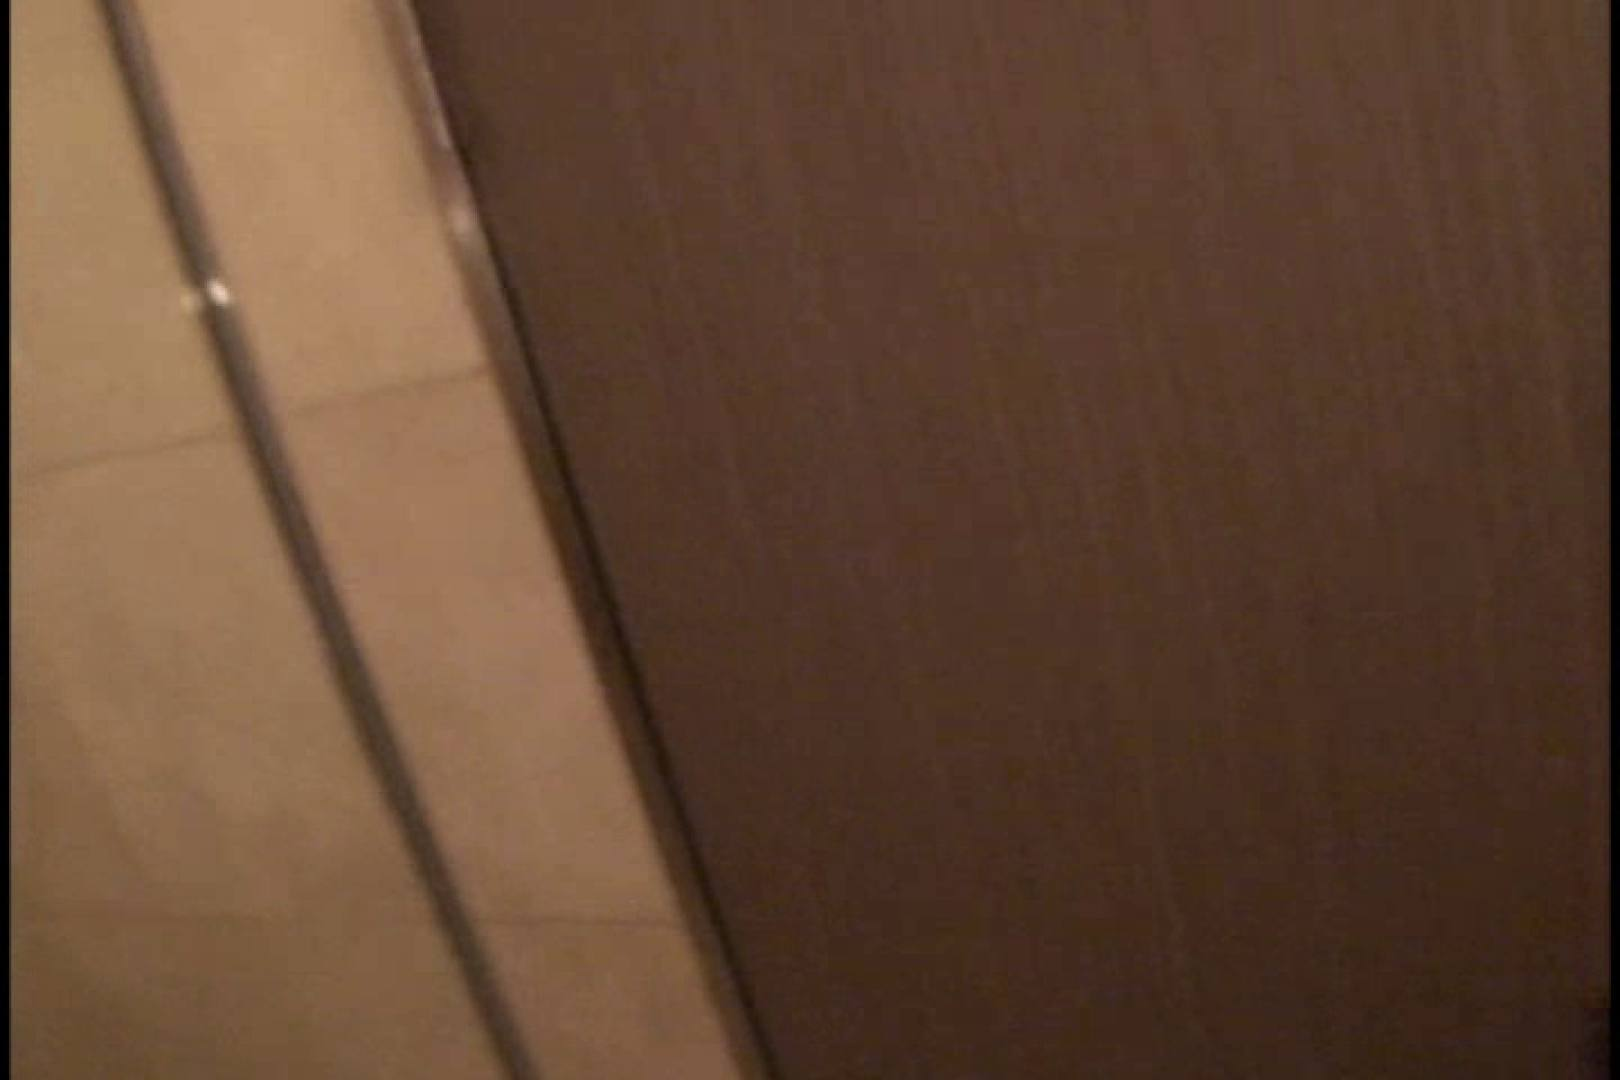 JDハンター全国ツアー vol.031 前編 OLのエロ生活   女子大生のエロ生活  61連発 53